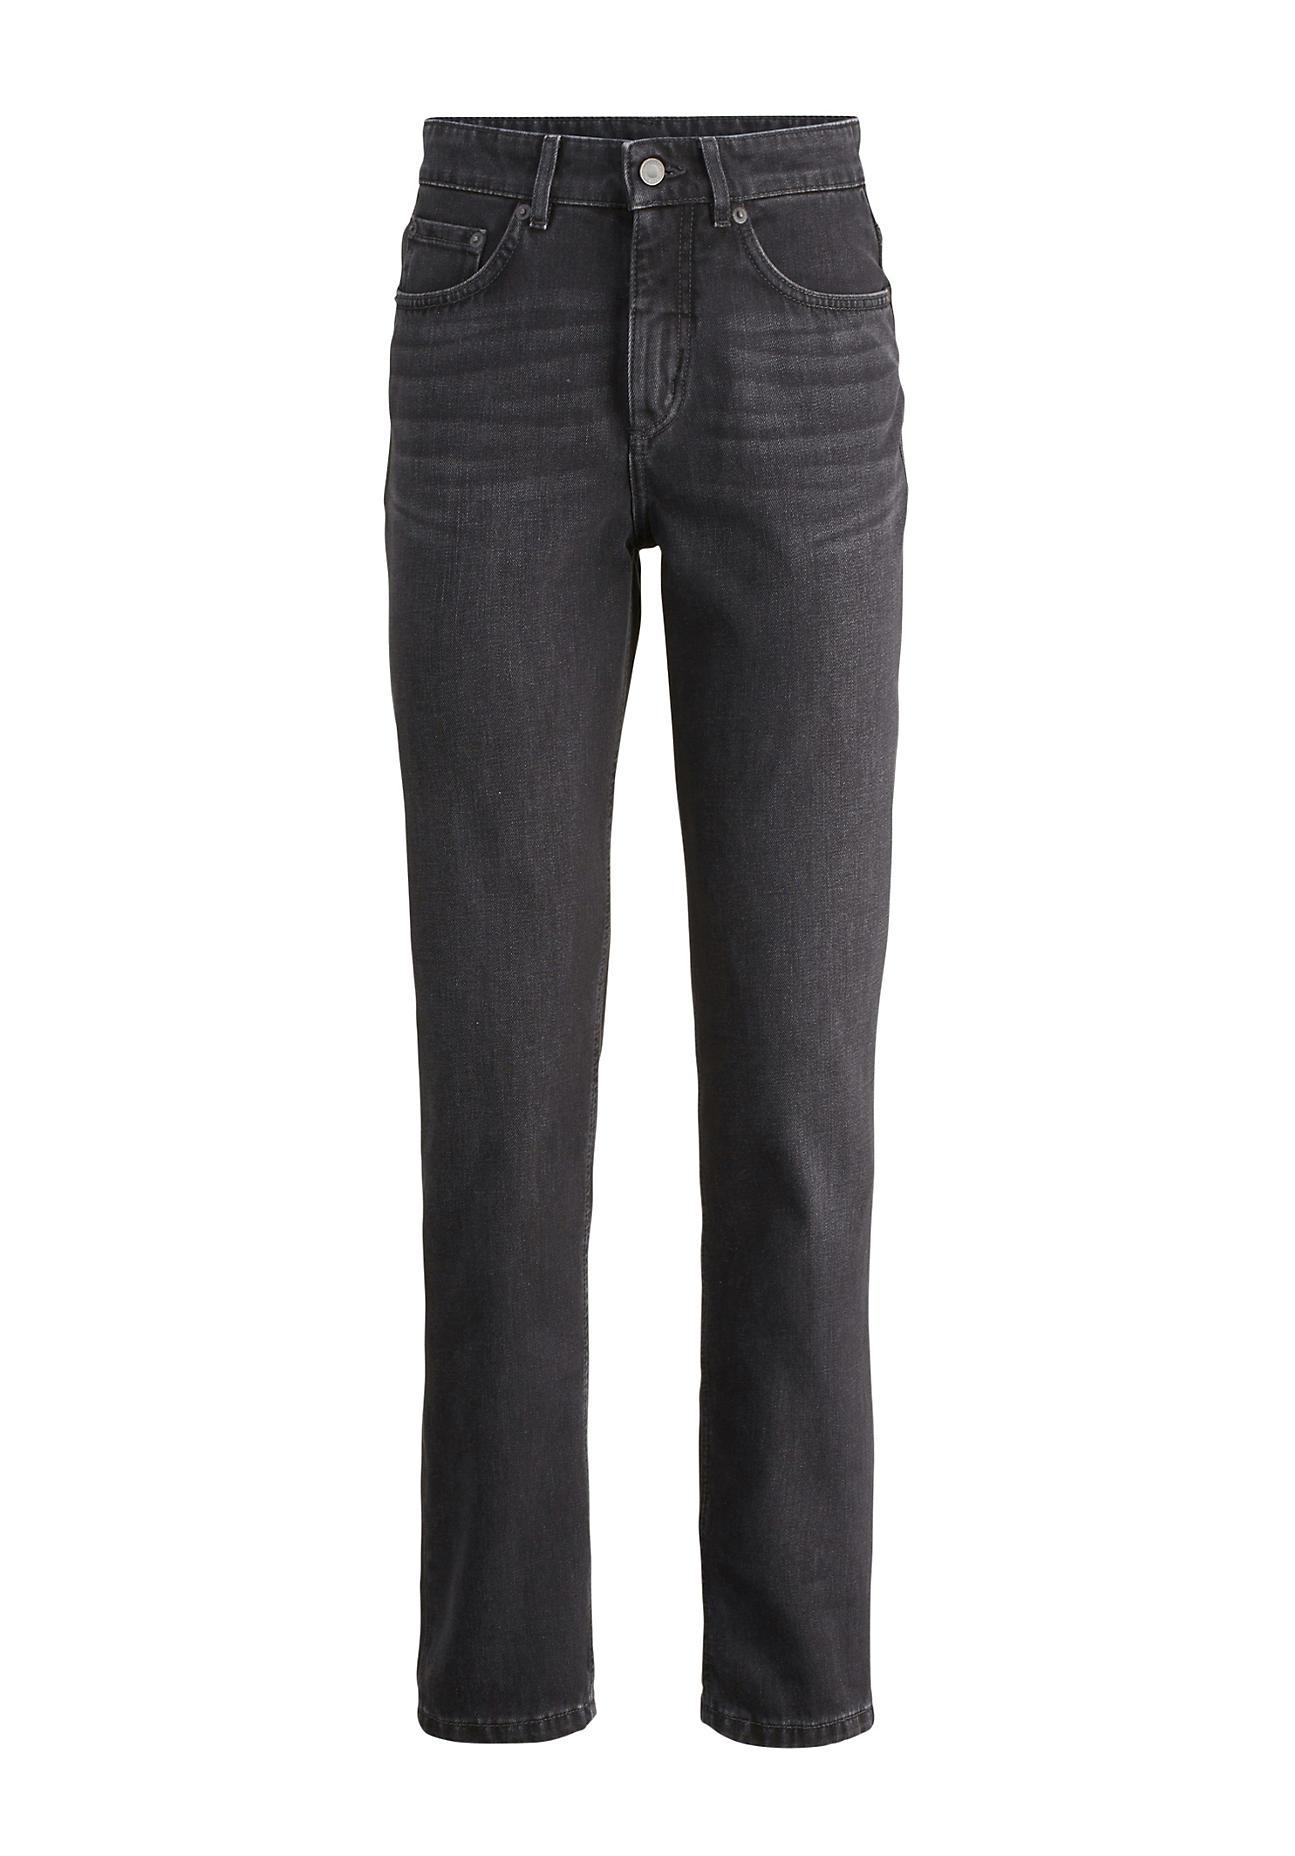 hessnatur Damen Jeans Hanna Mom Fit aus Bio-Denim – grau – Größe 26/32